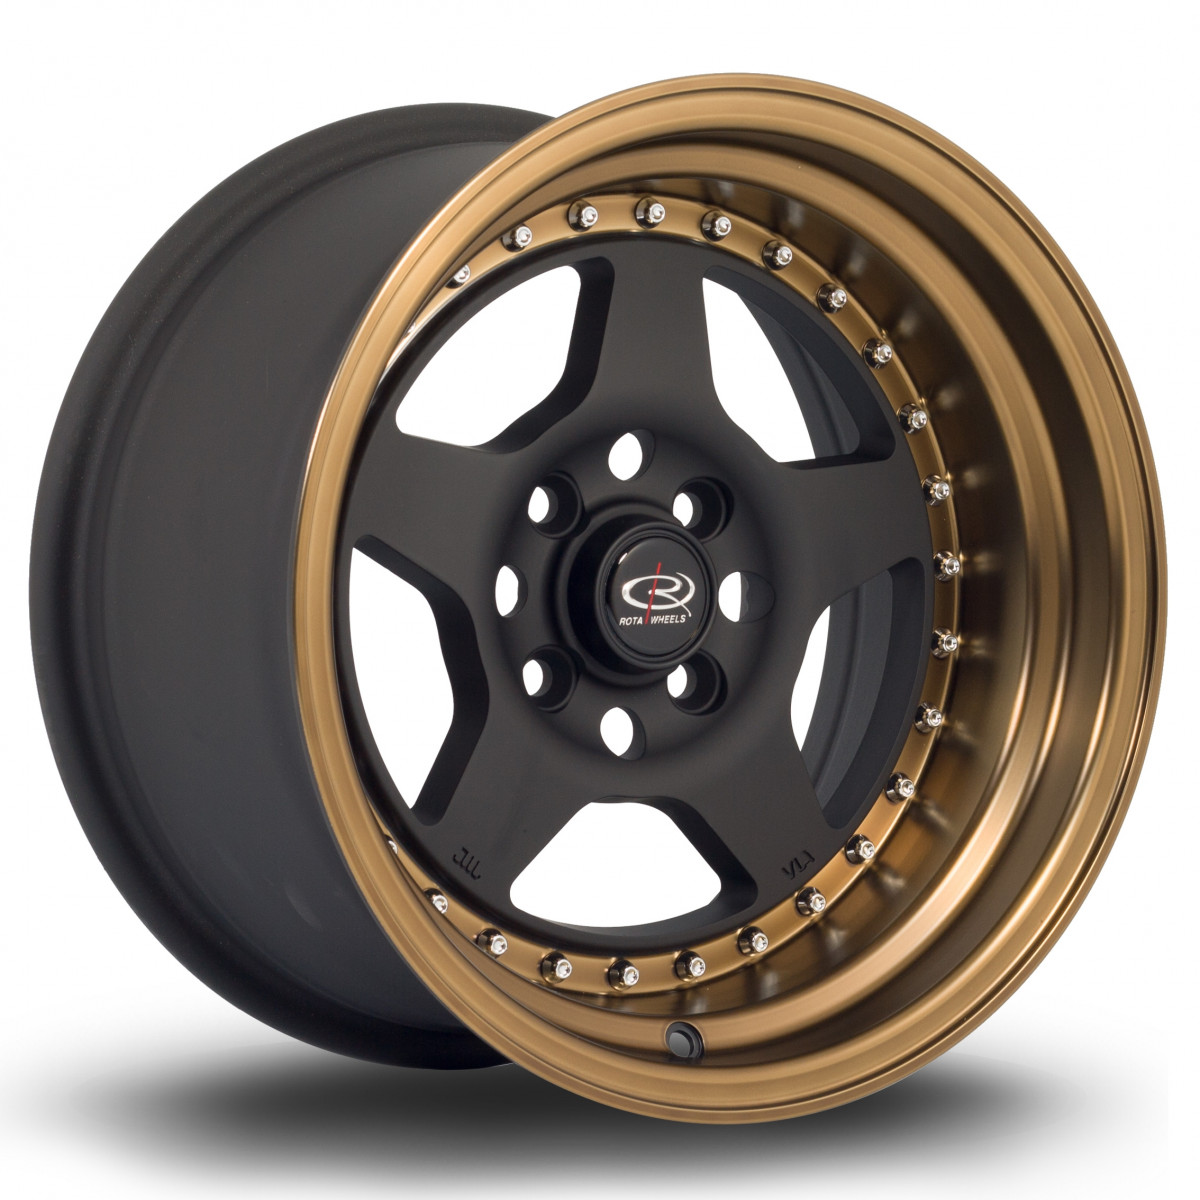 Kyusha 15x8 4x114 ET0 Flat Black with Speed Bronze Lip